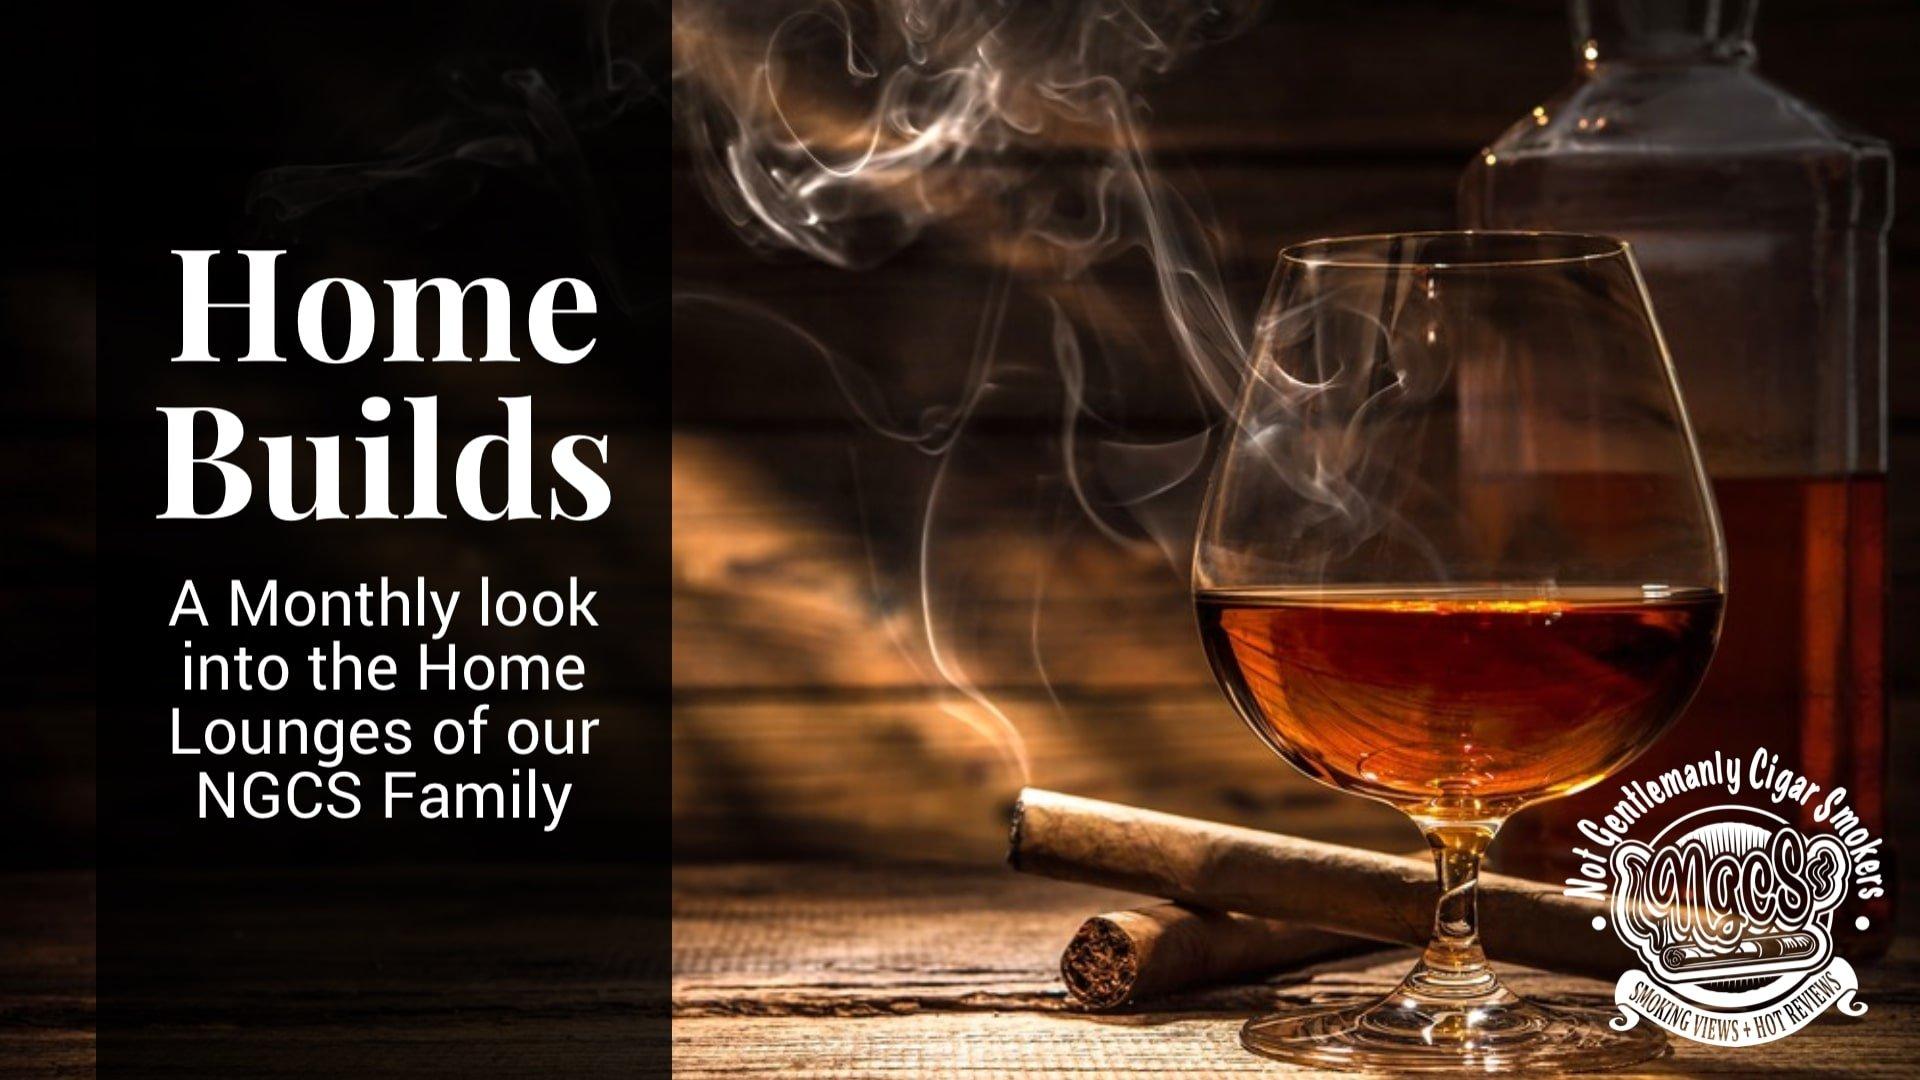 Scori's – Home Builds